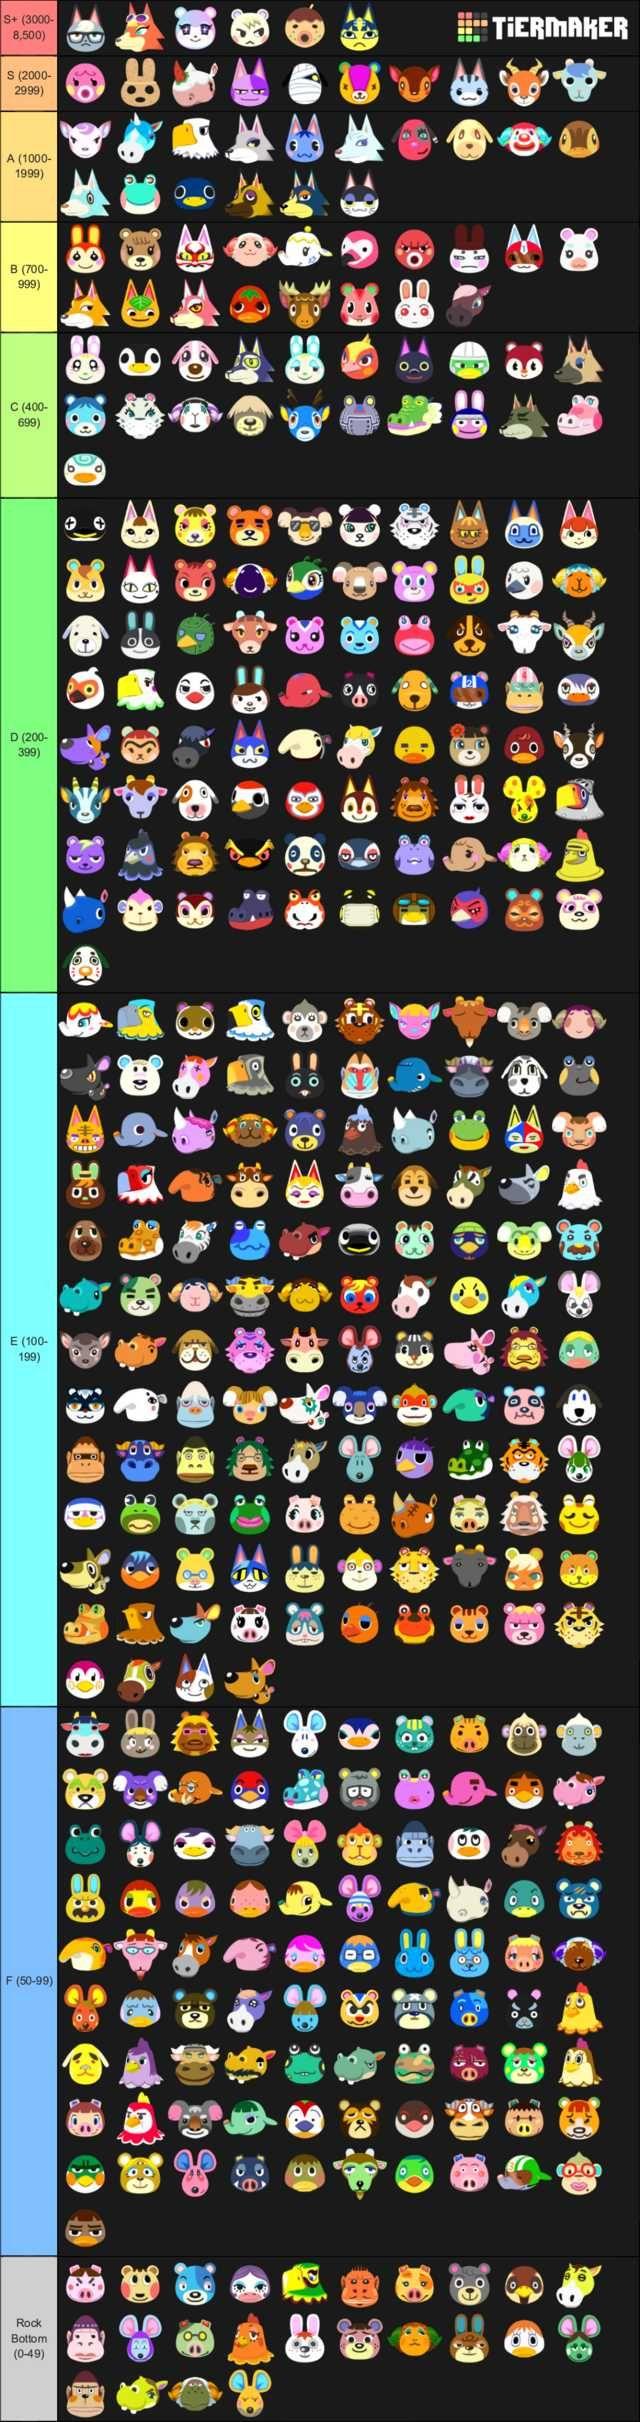 Acnh Popularity Tier List Animal Crossing Villagers Animal Crossing Funny Animal Crossing